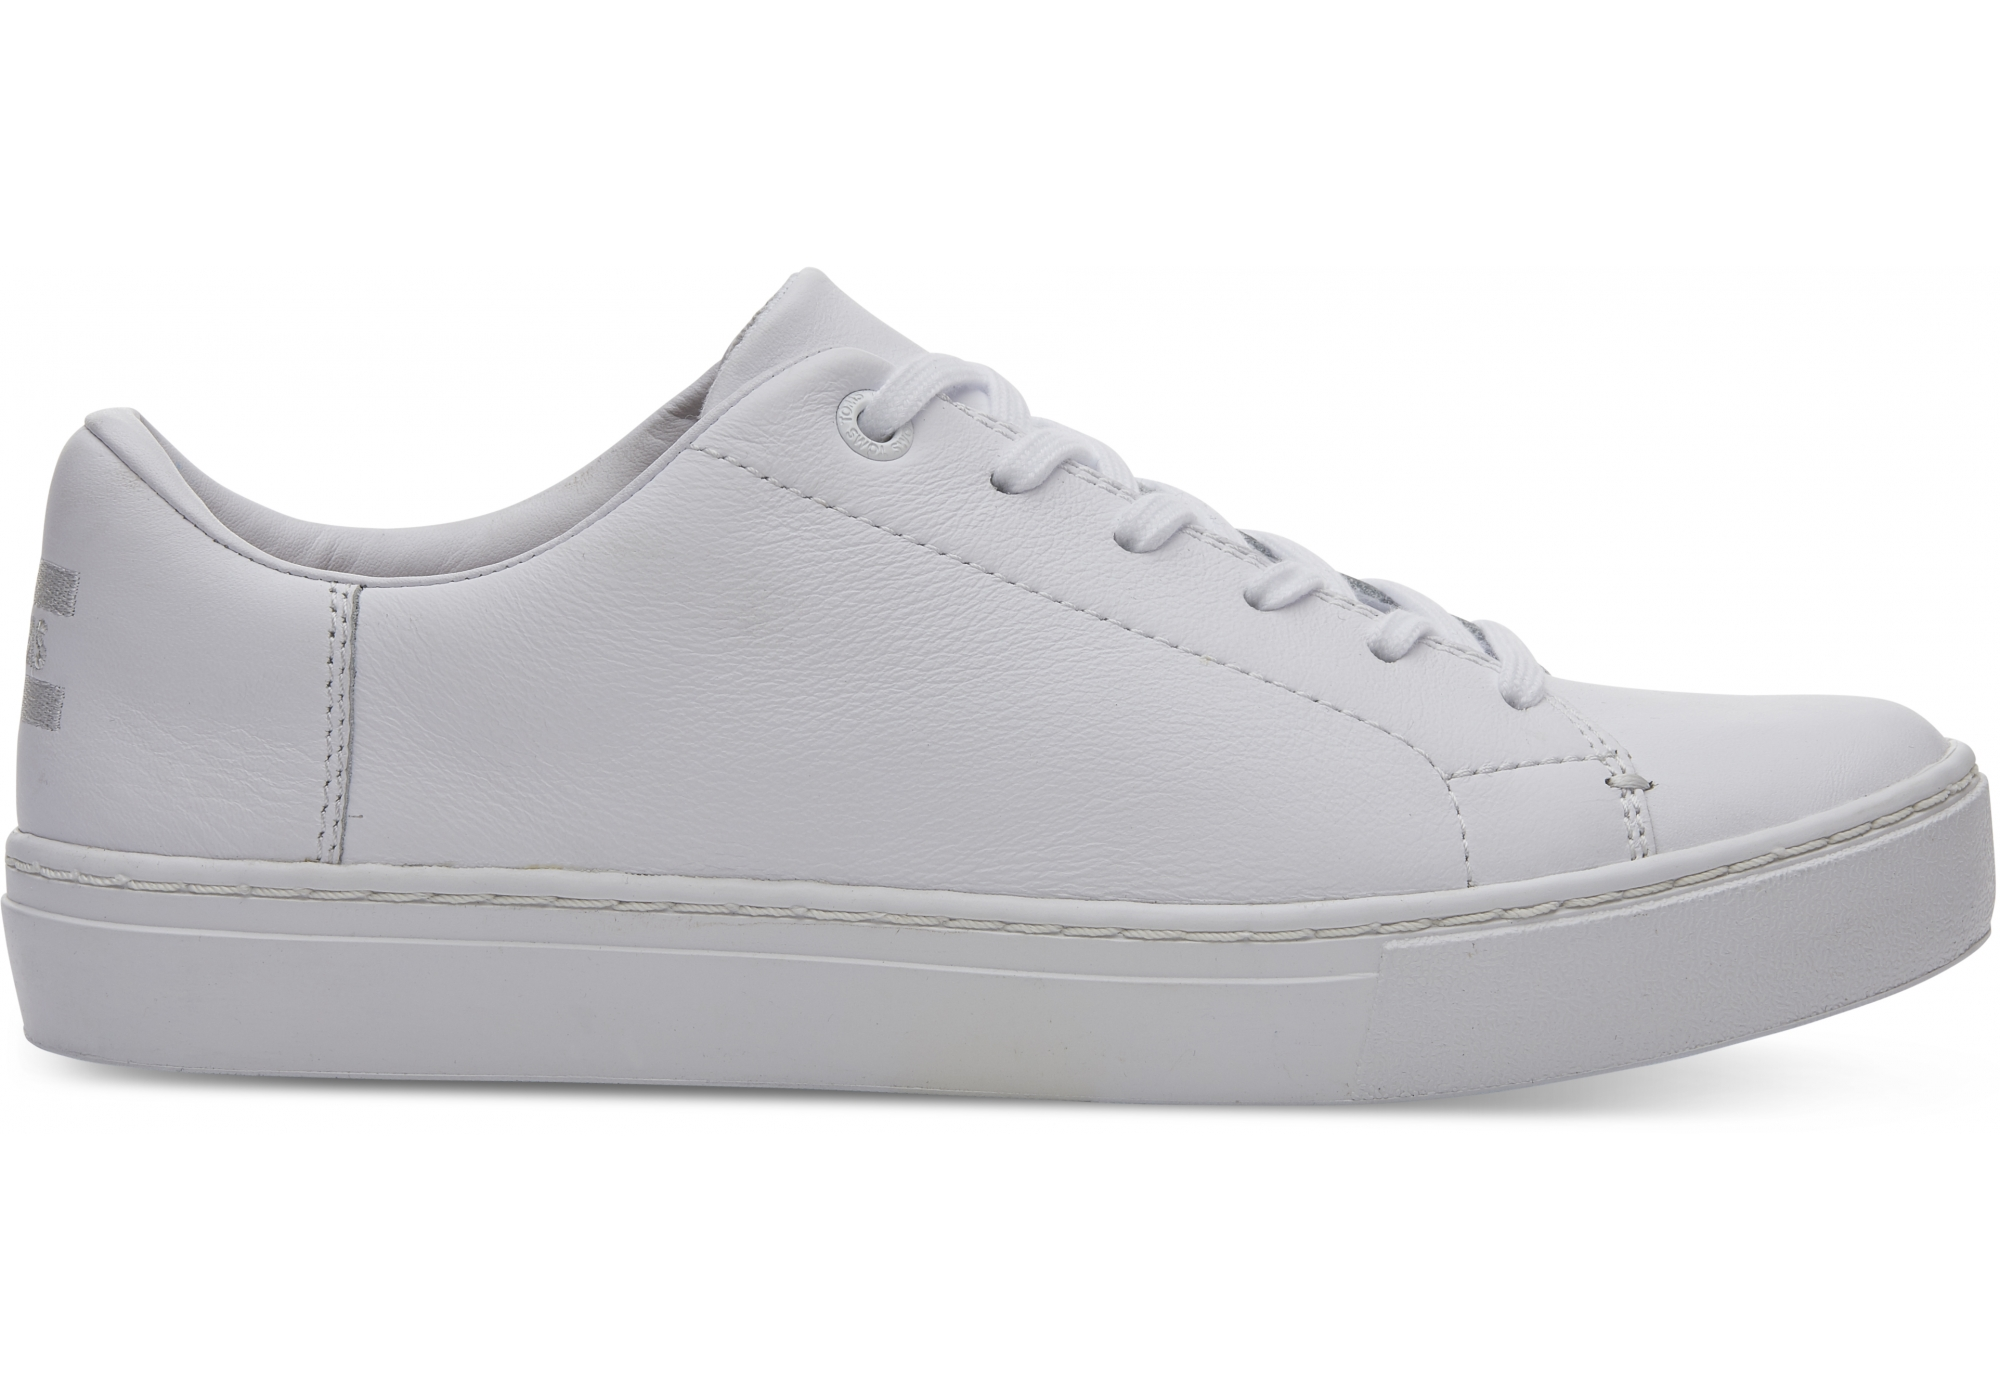 c8a7b8a57218c URBANLUX | Dámske biele tenisky TOMS Leather Lenox